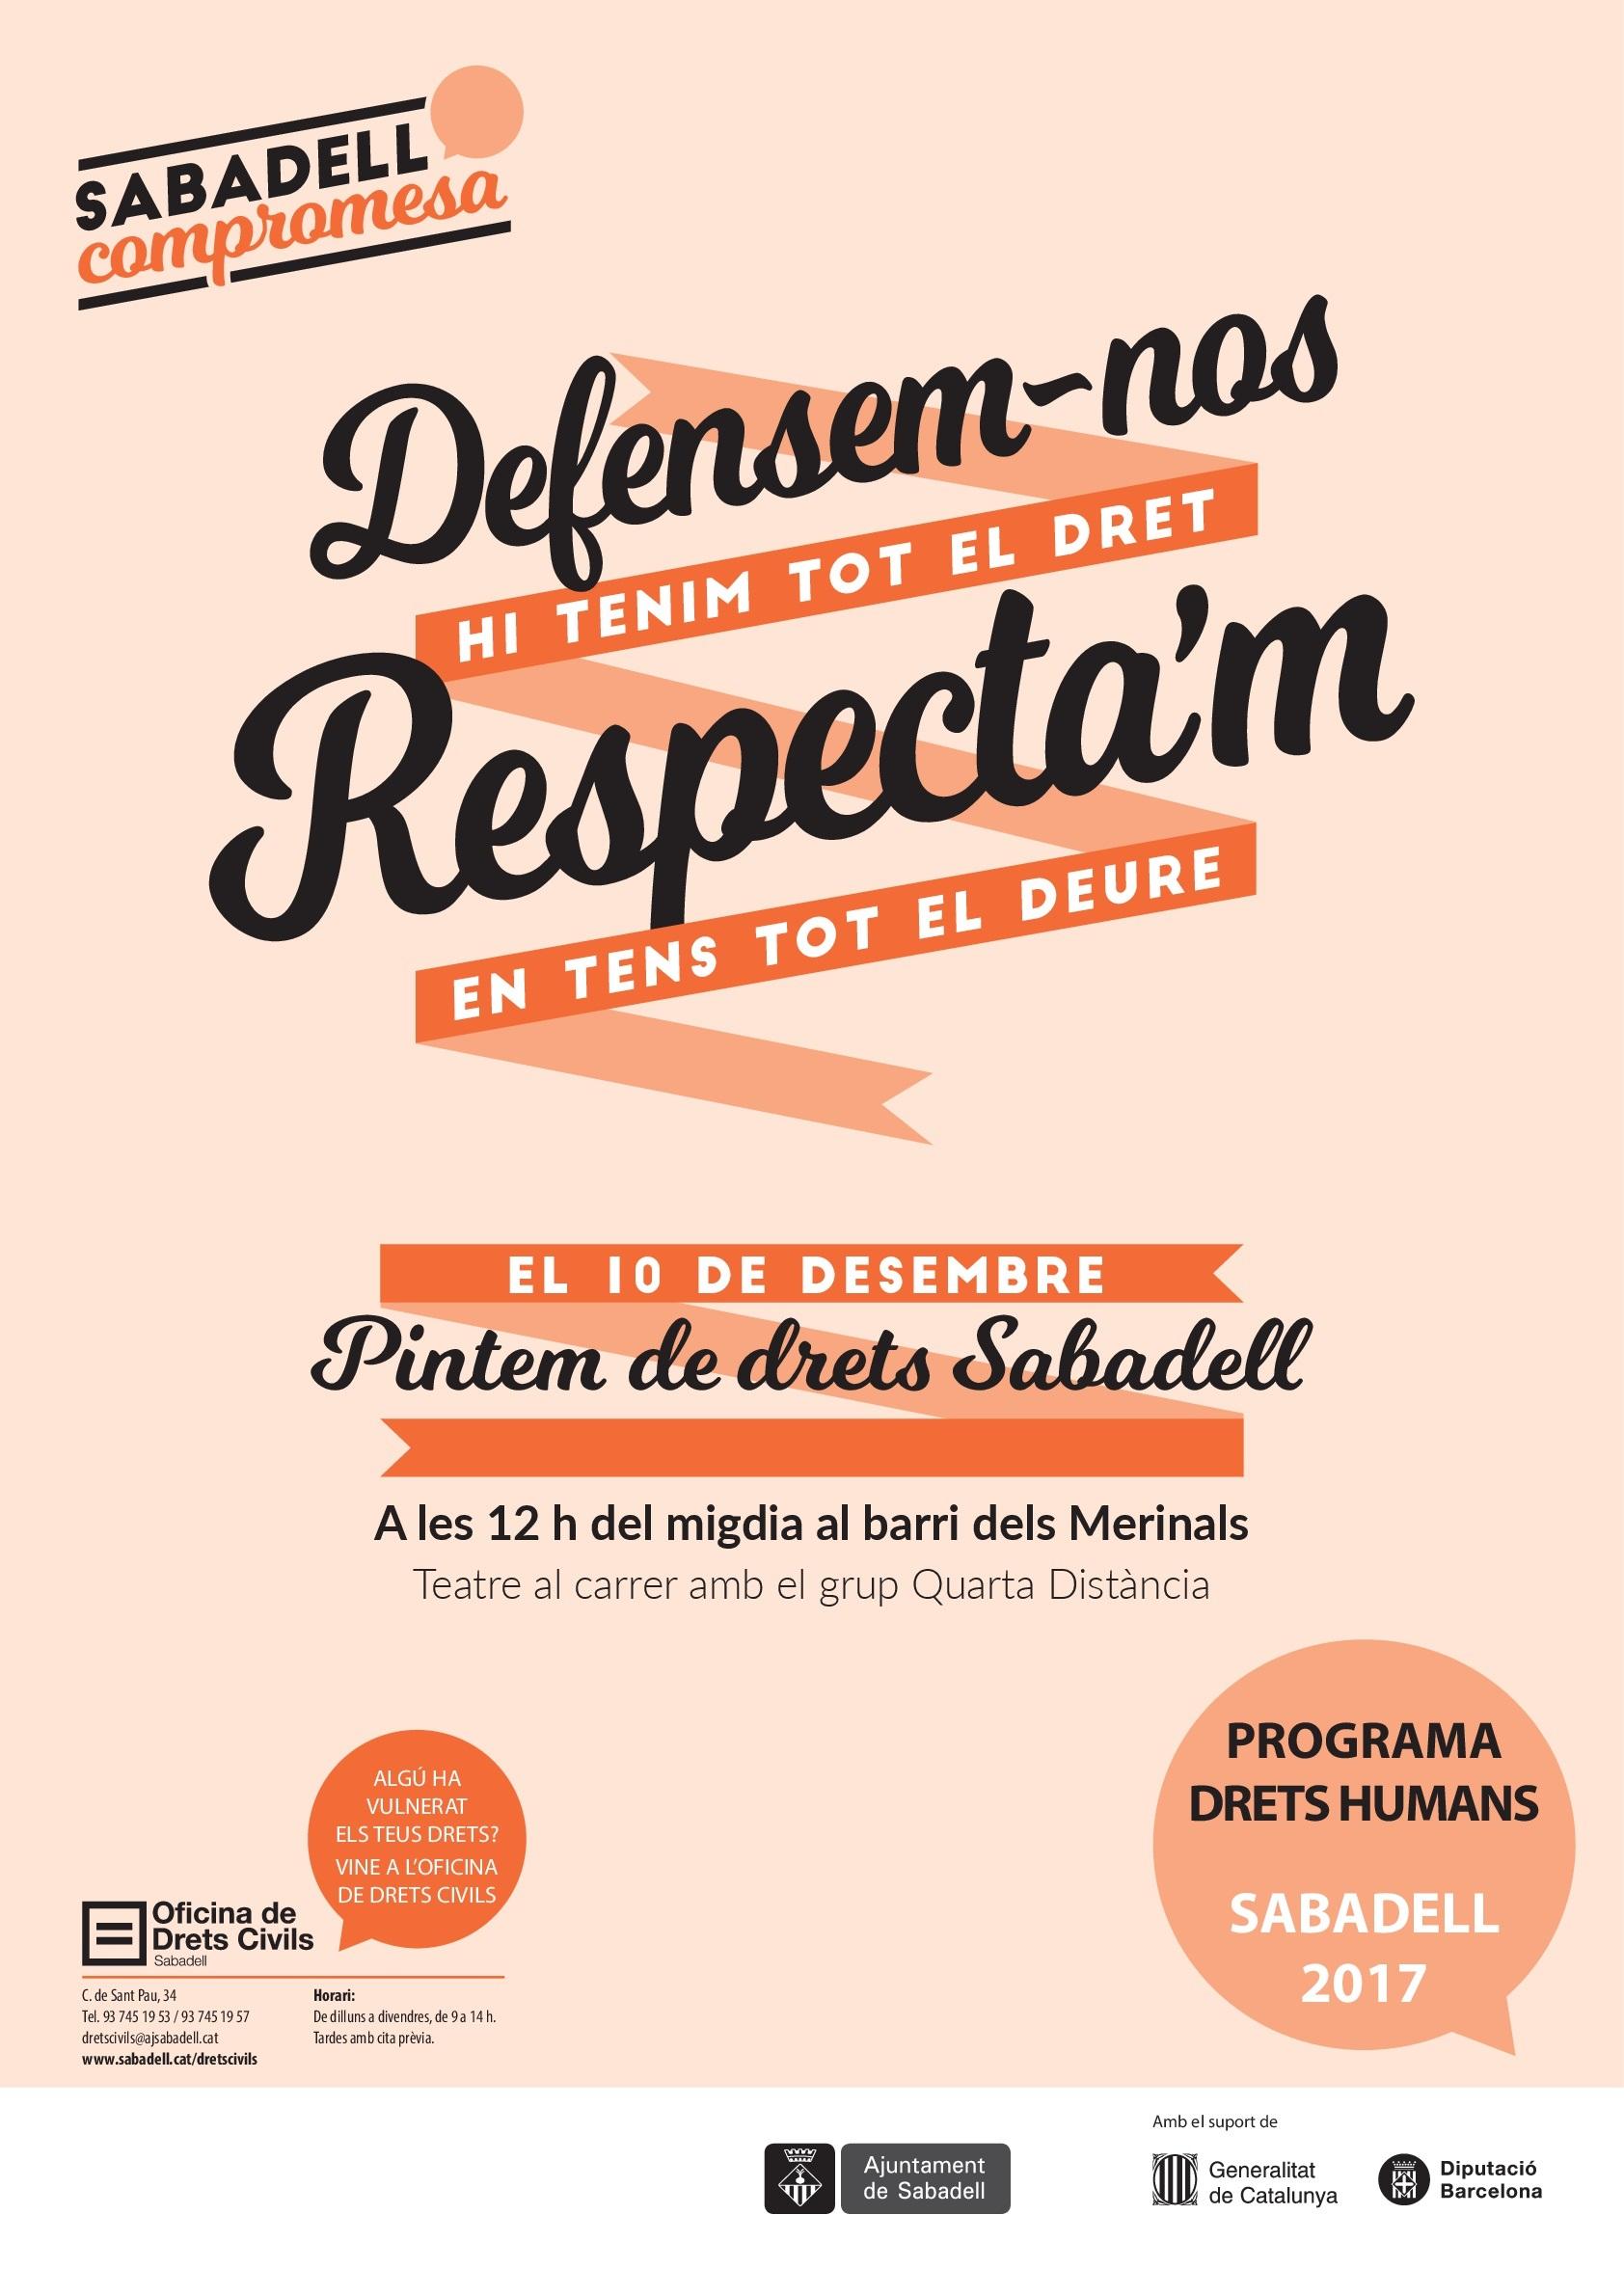 cartell ddhh17-001